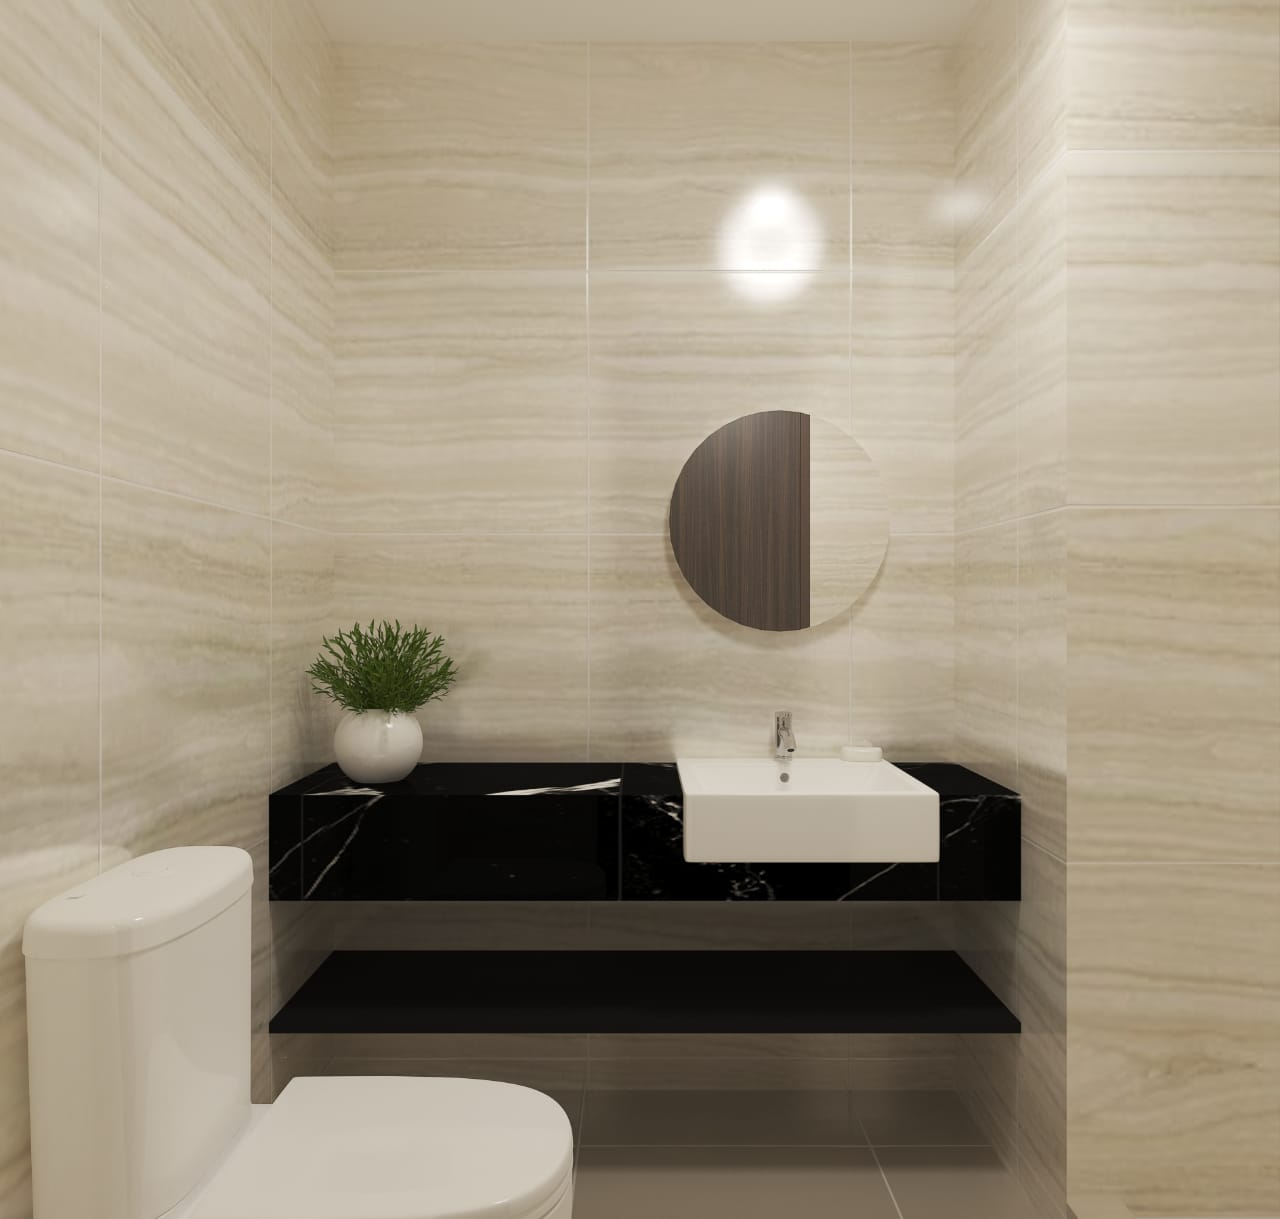 2BR-Bathroom